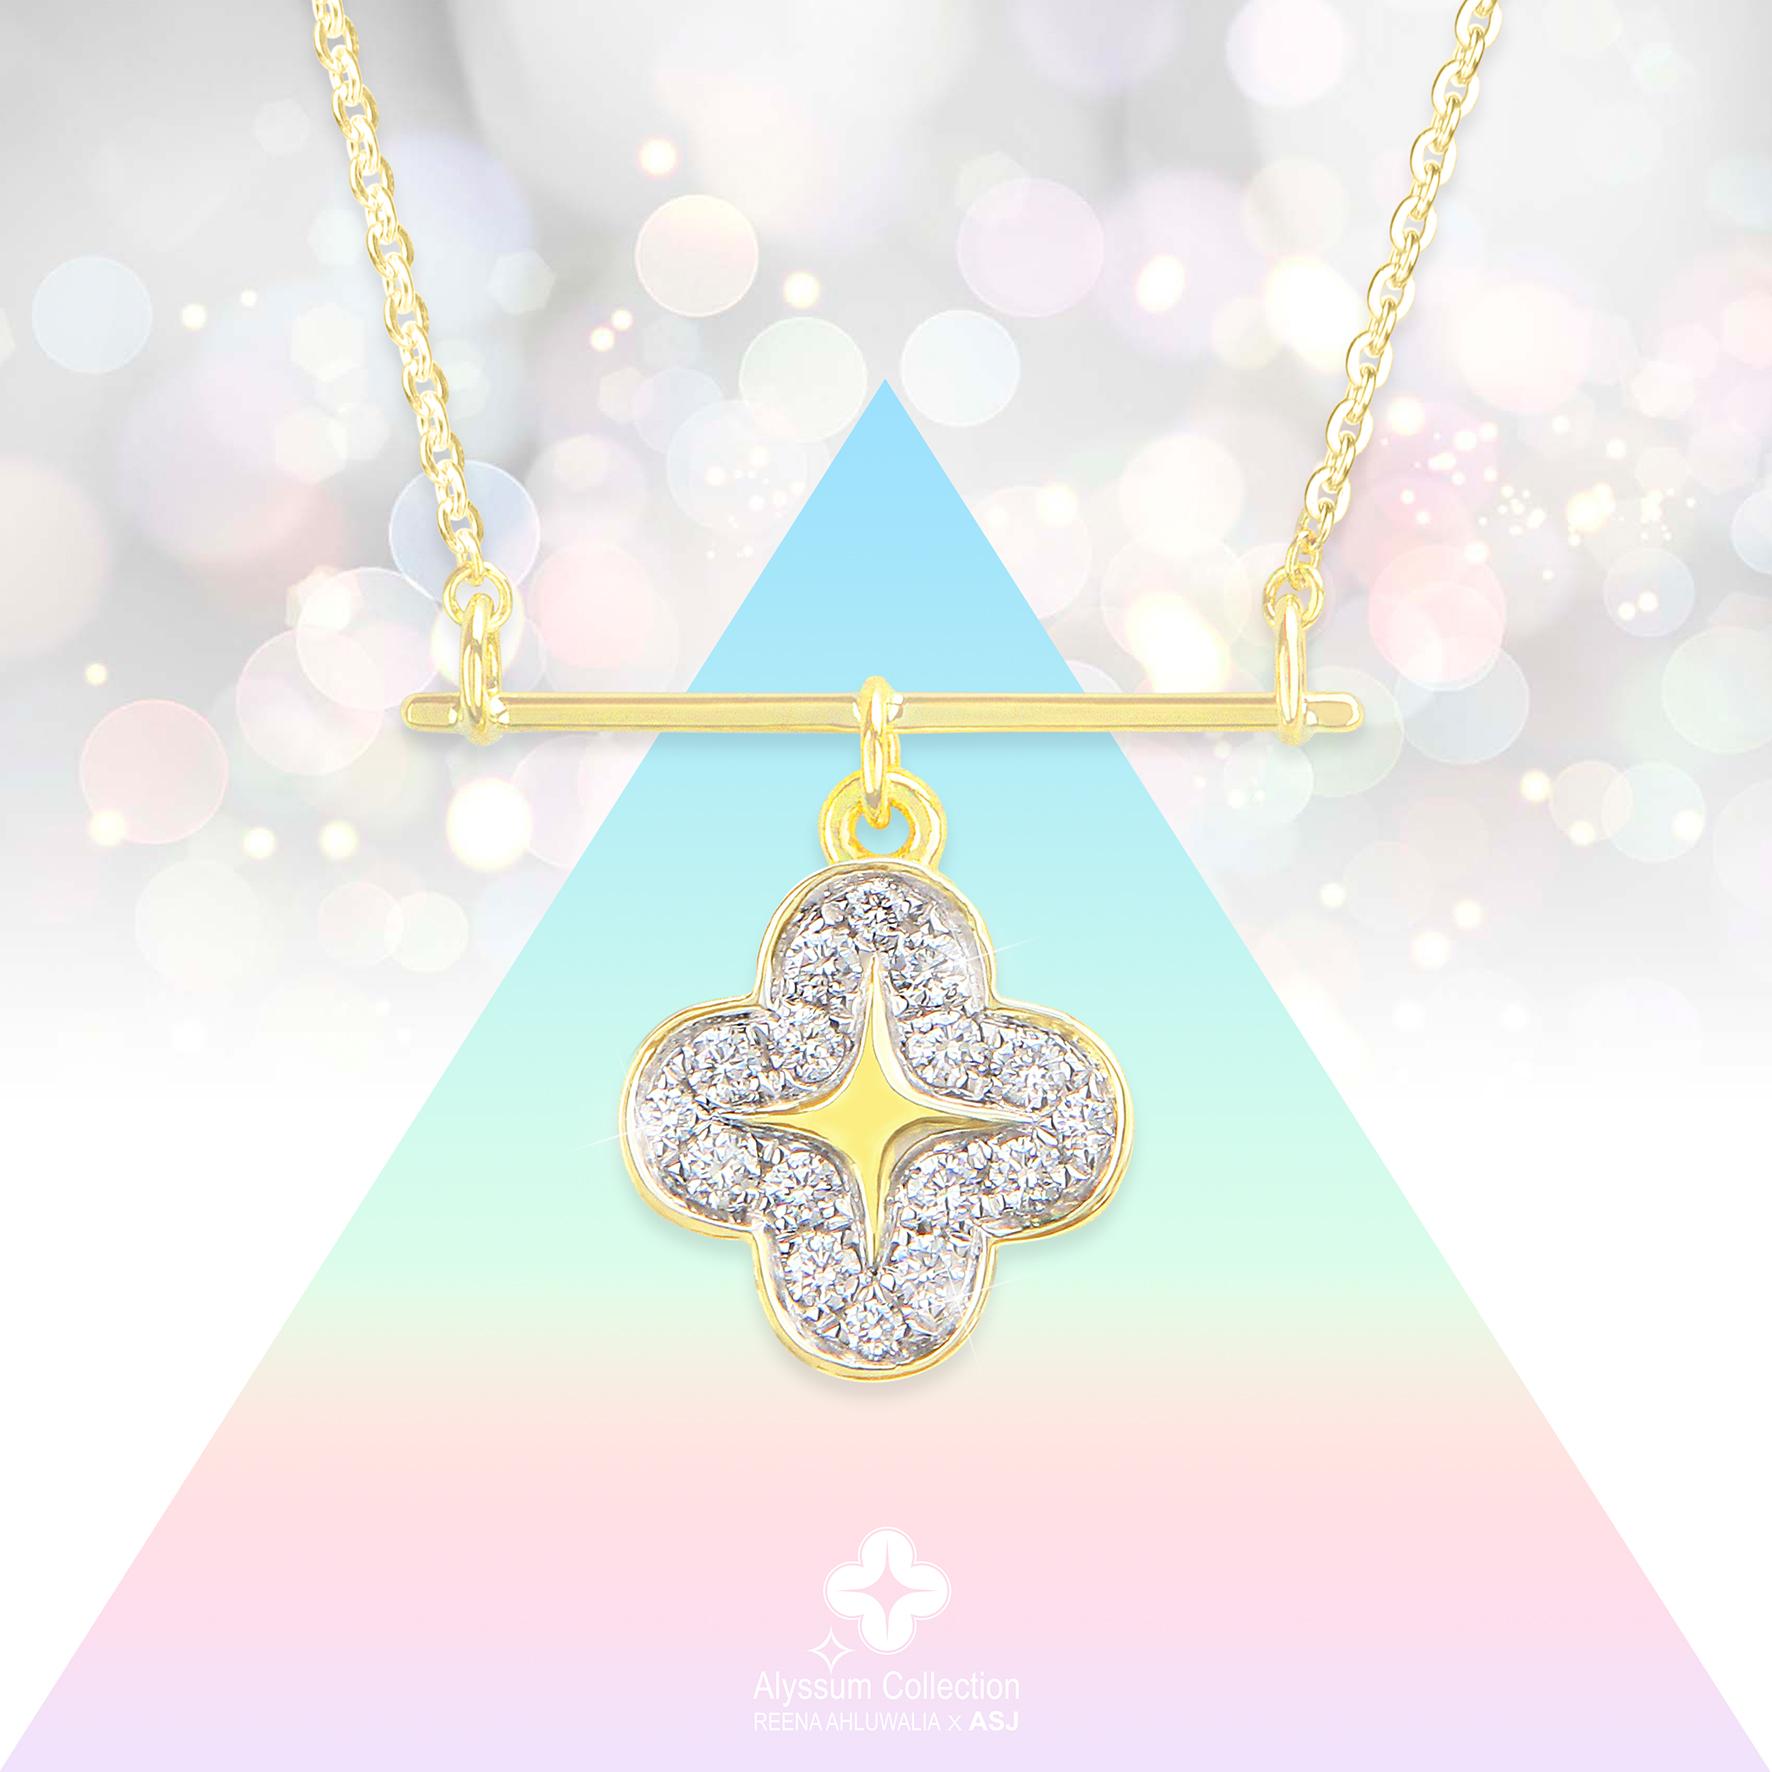 6Alyssum By Reena Ahluwalia_Diamonds_Gold_Collection.jpg